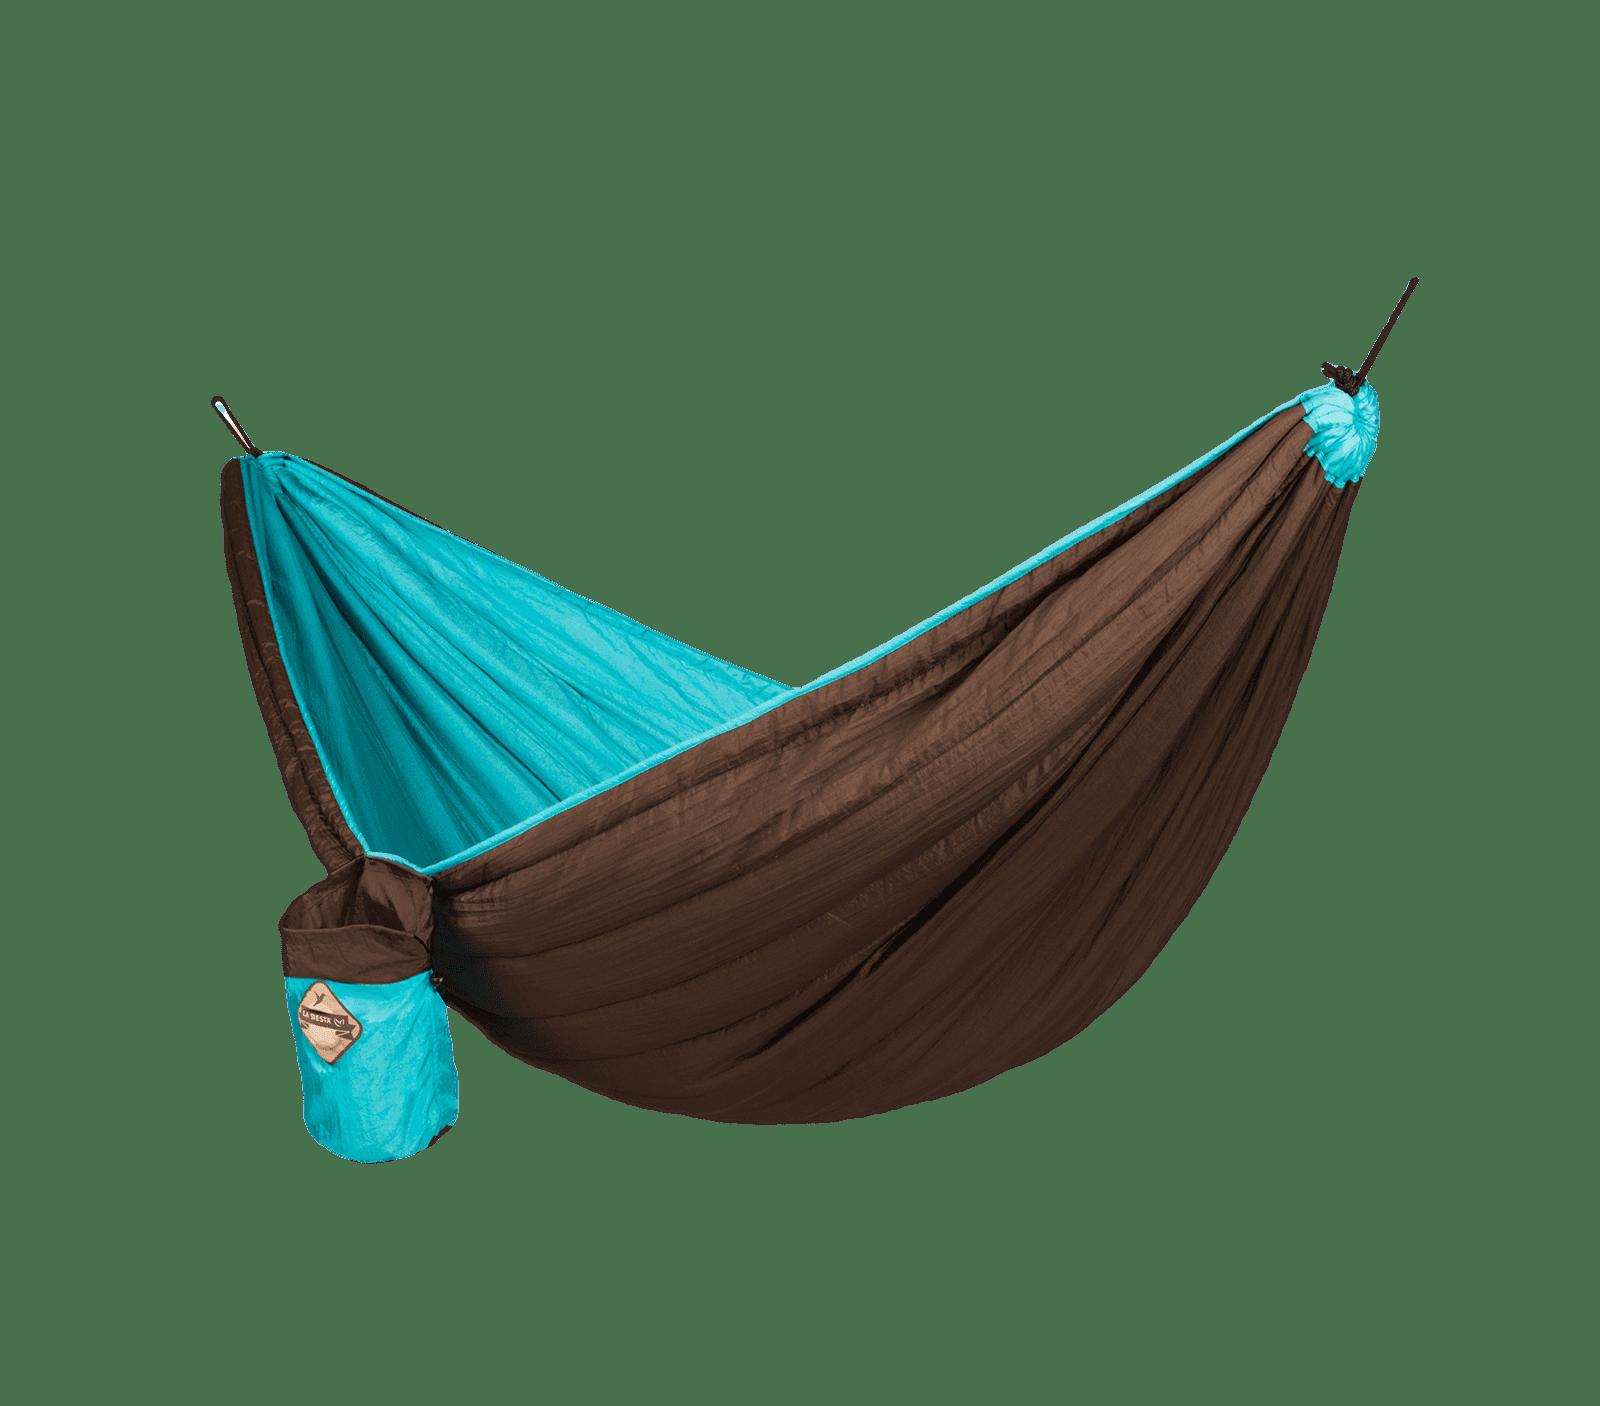 Hangmat colibri padded (turquoise)